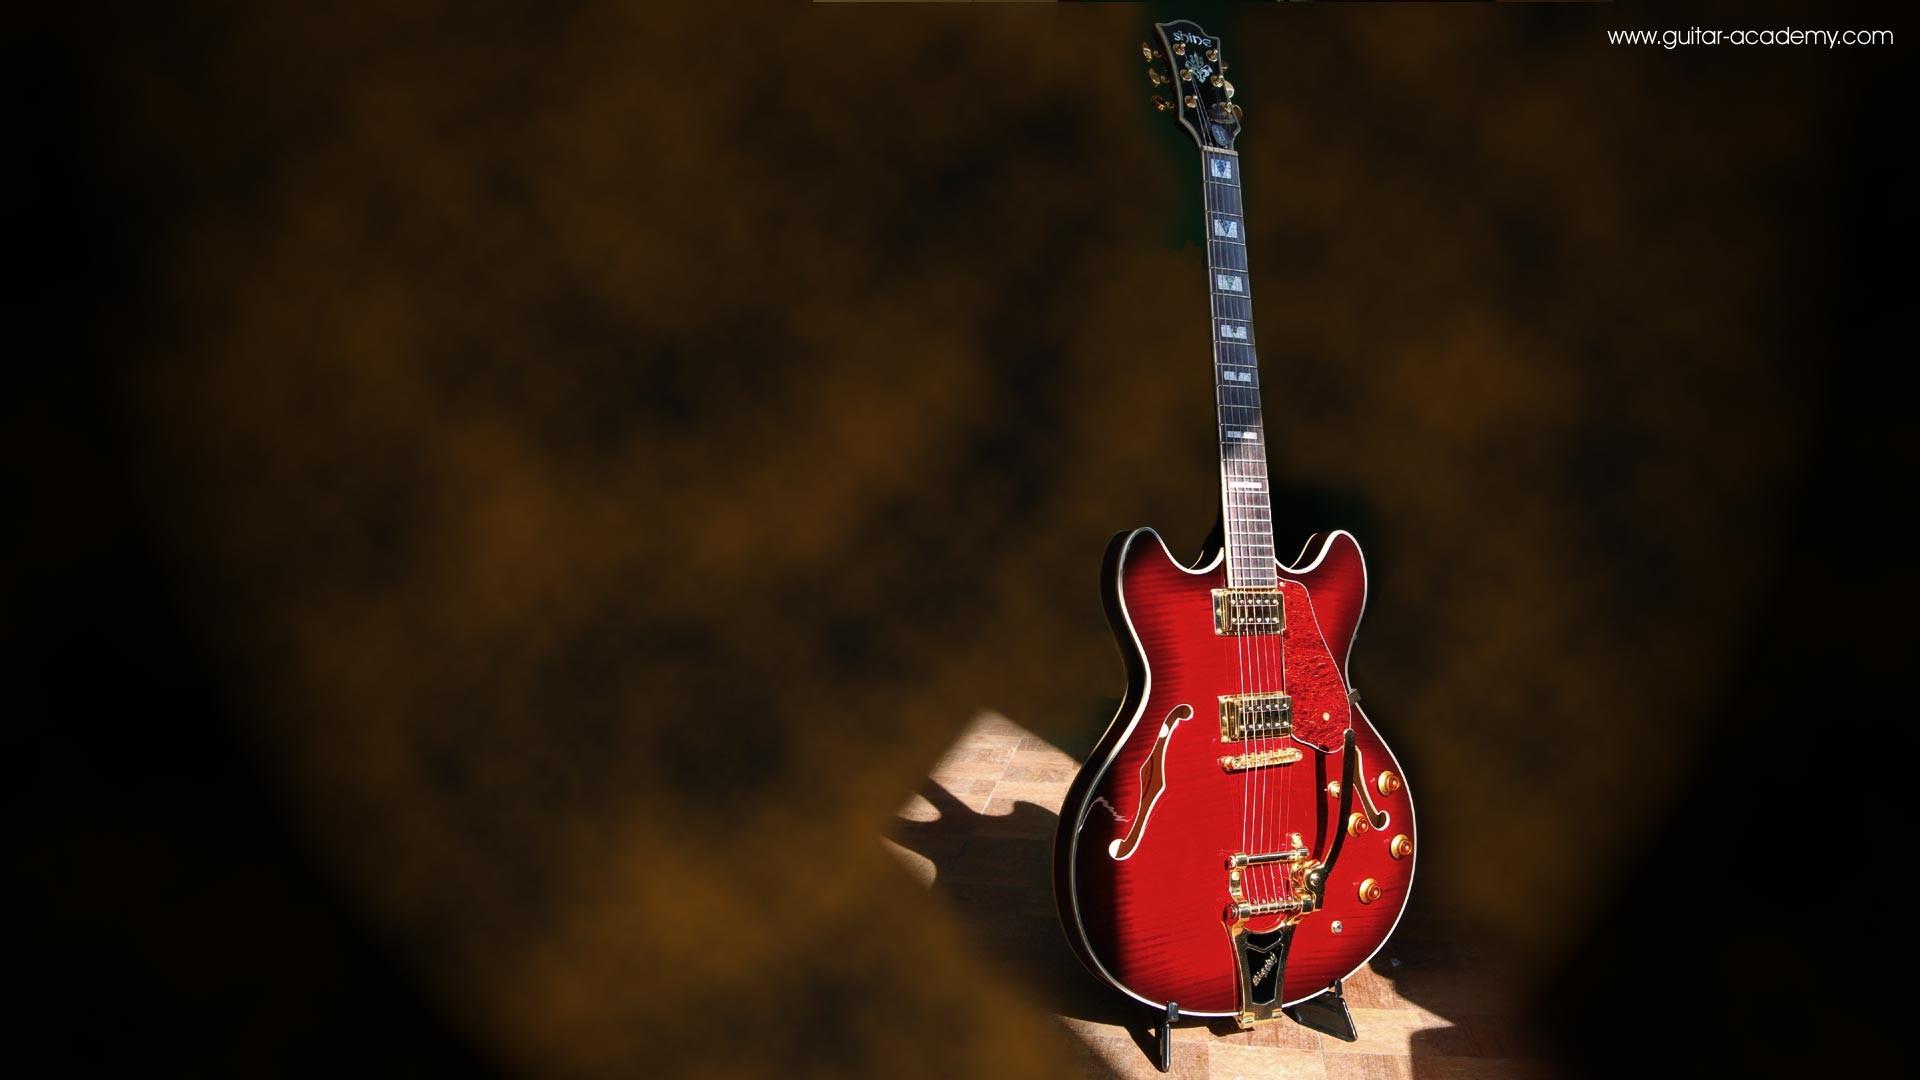 Guitar wallpaper, Ibanez Steve Vai JEM 7V electric guitar